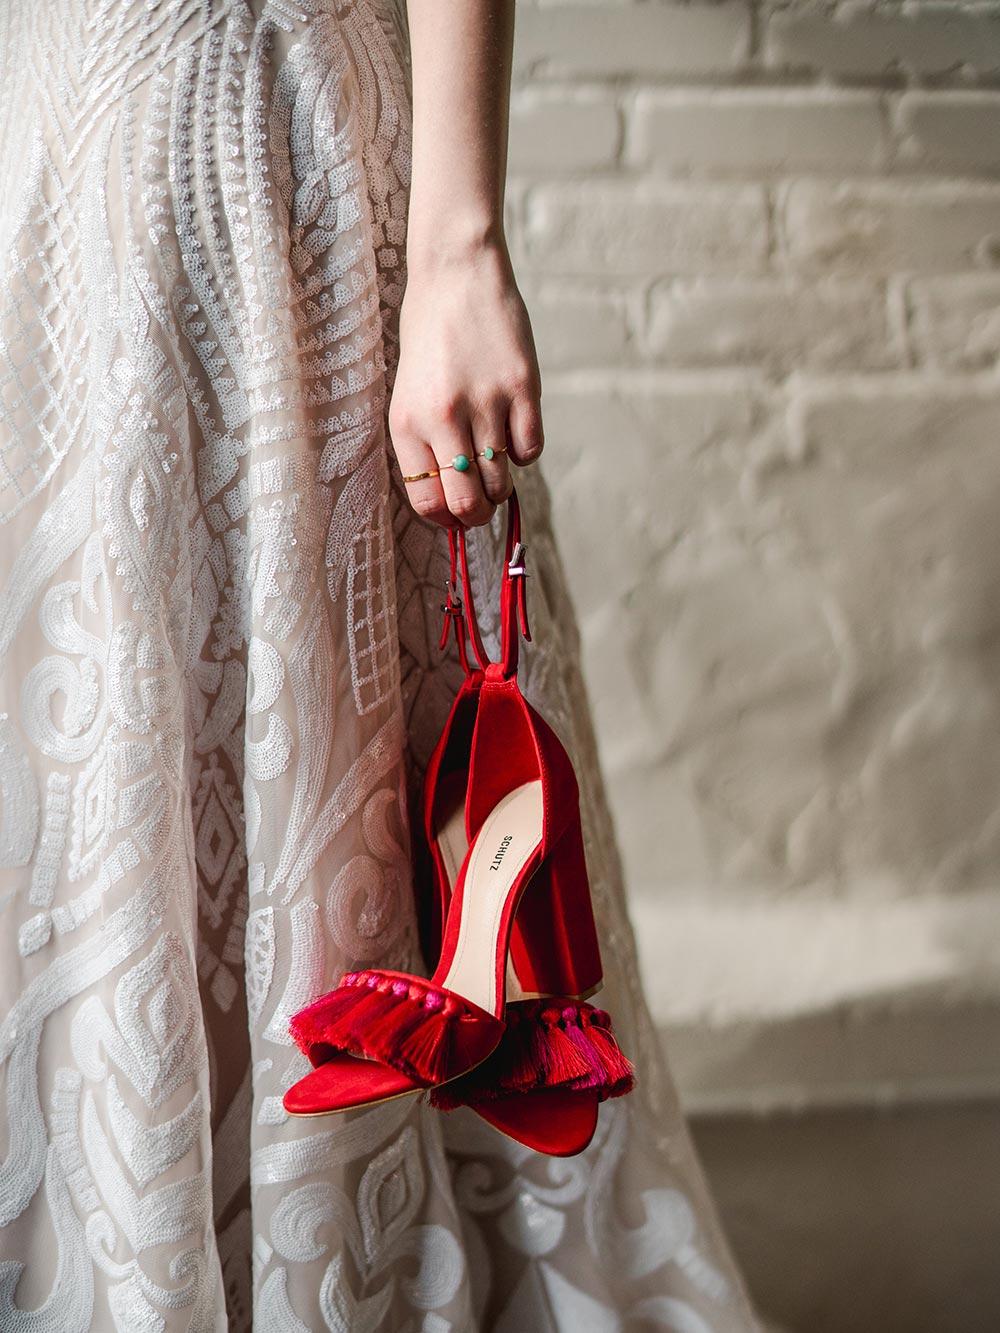 fun red wedding heels with tassel fringe